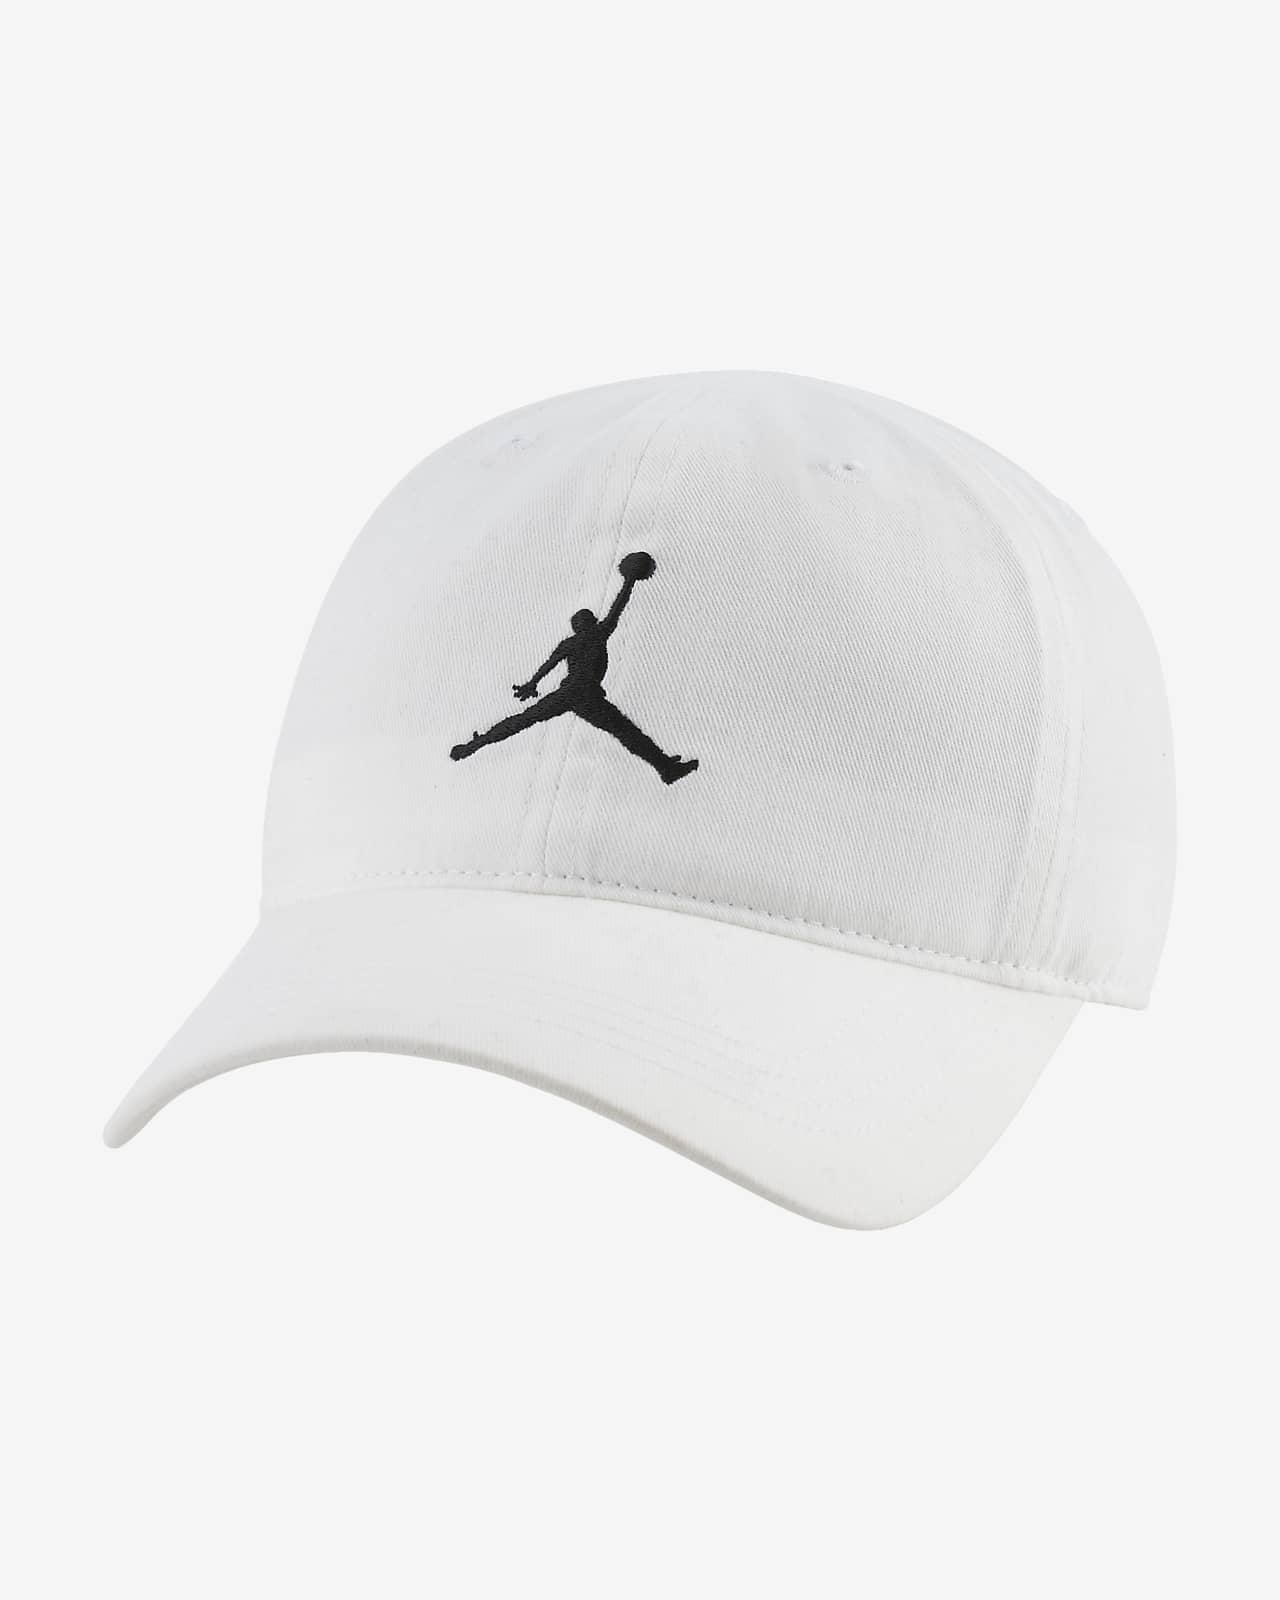 Jordan Big Kids' Adjustable Hat